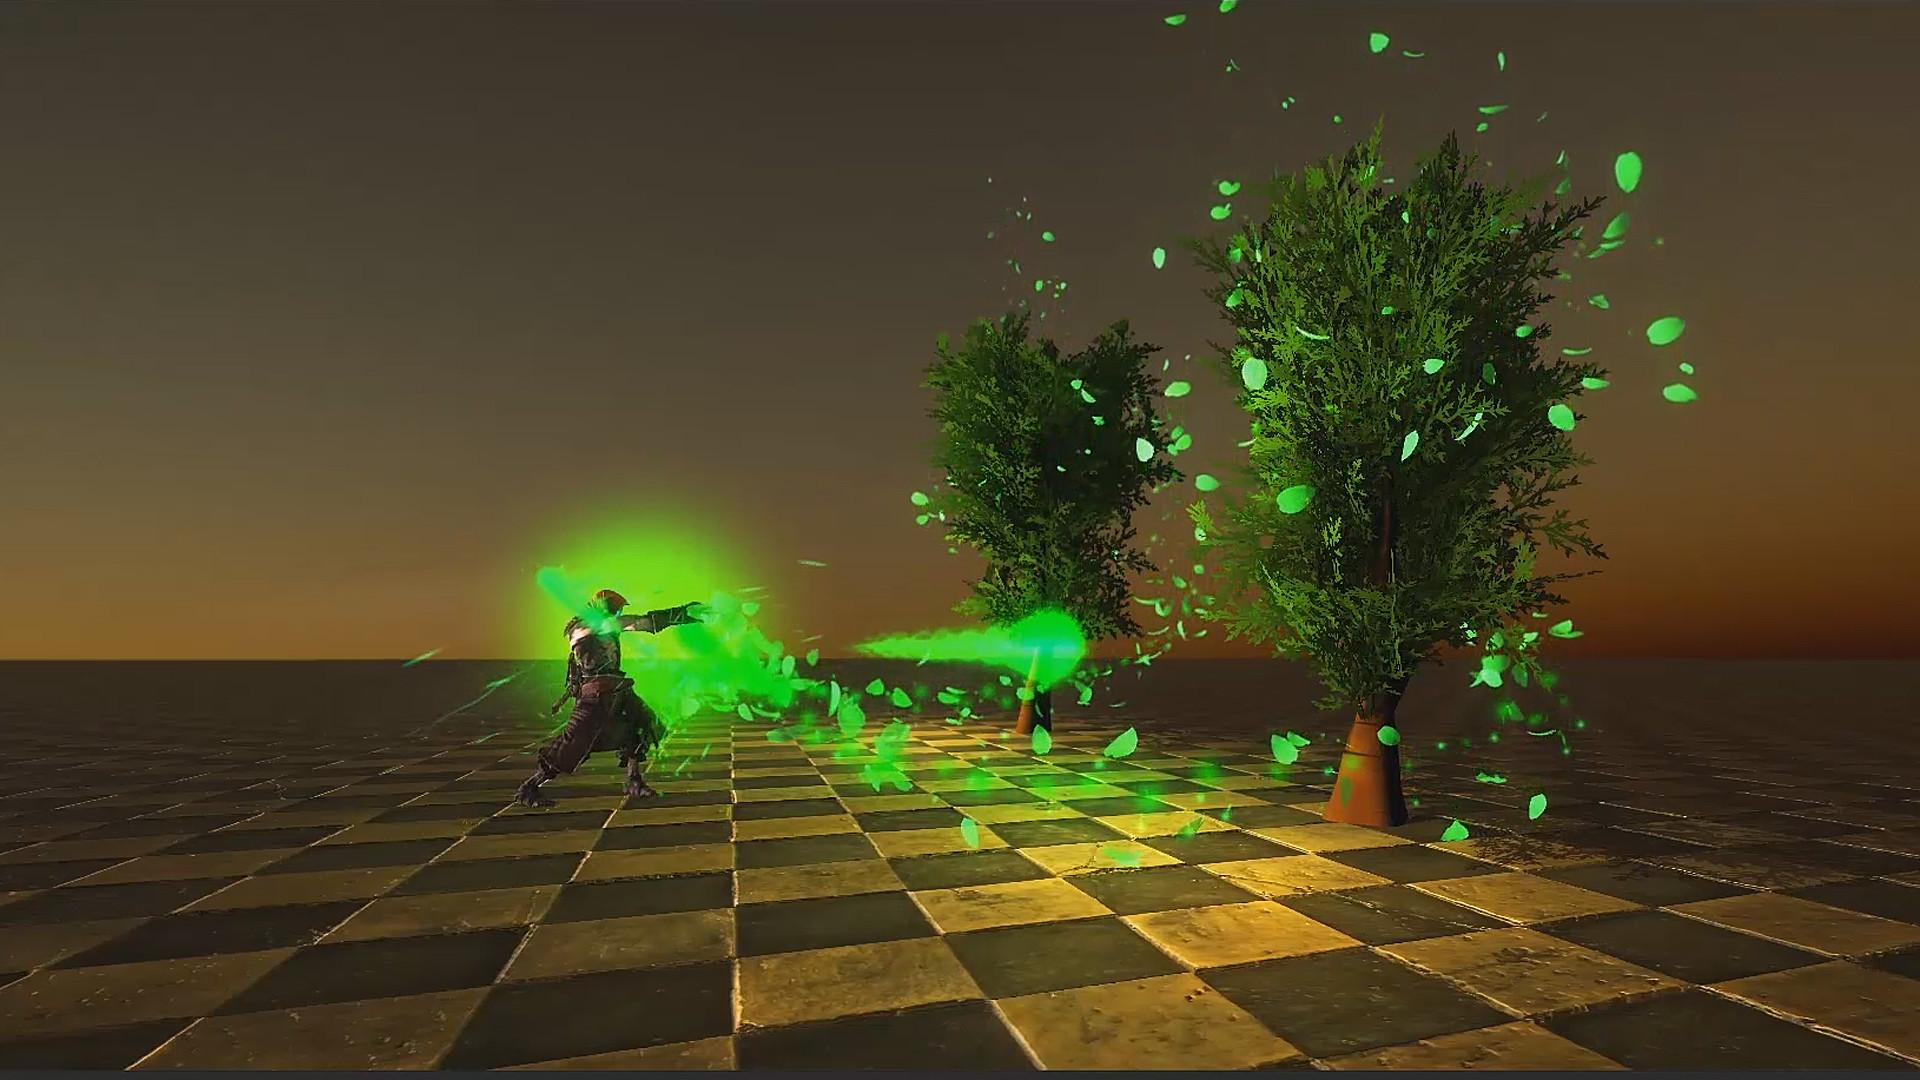 ArtStation - Game Effects - Nature Attack VFX, Gabriel Aguiar